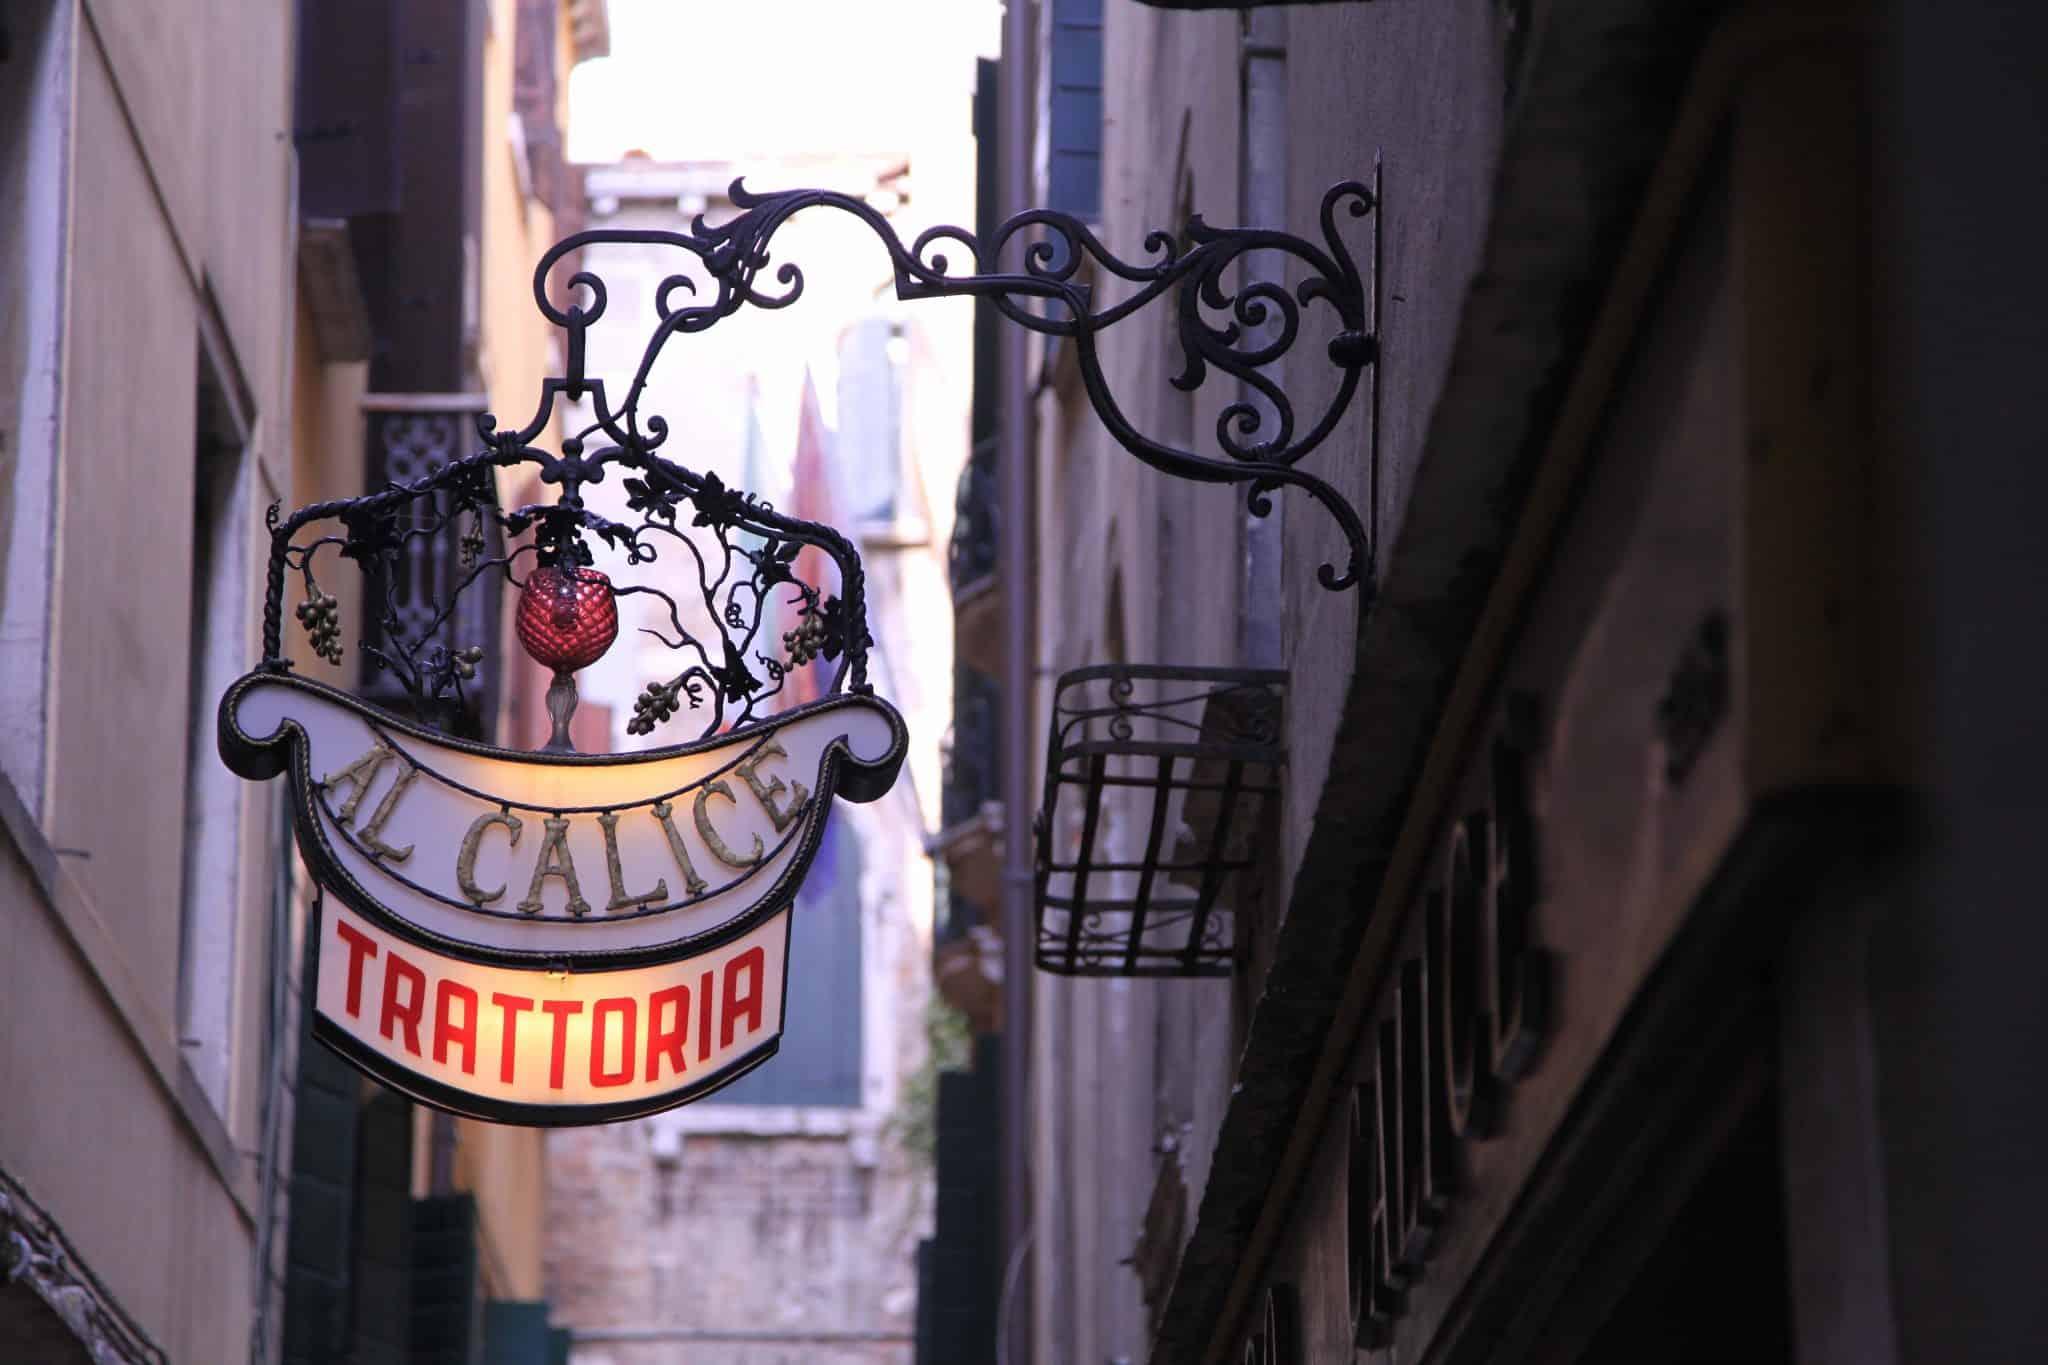 Venice Travel Guide